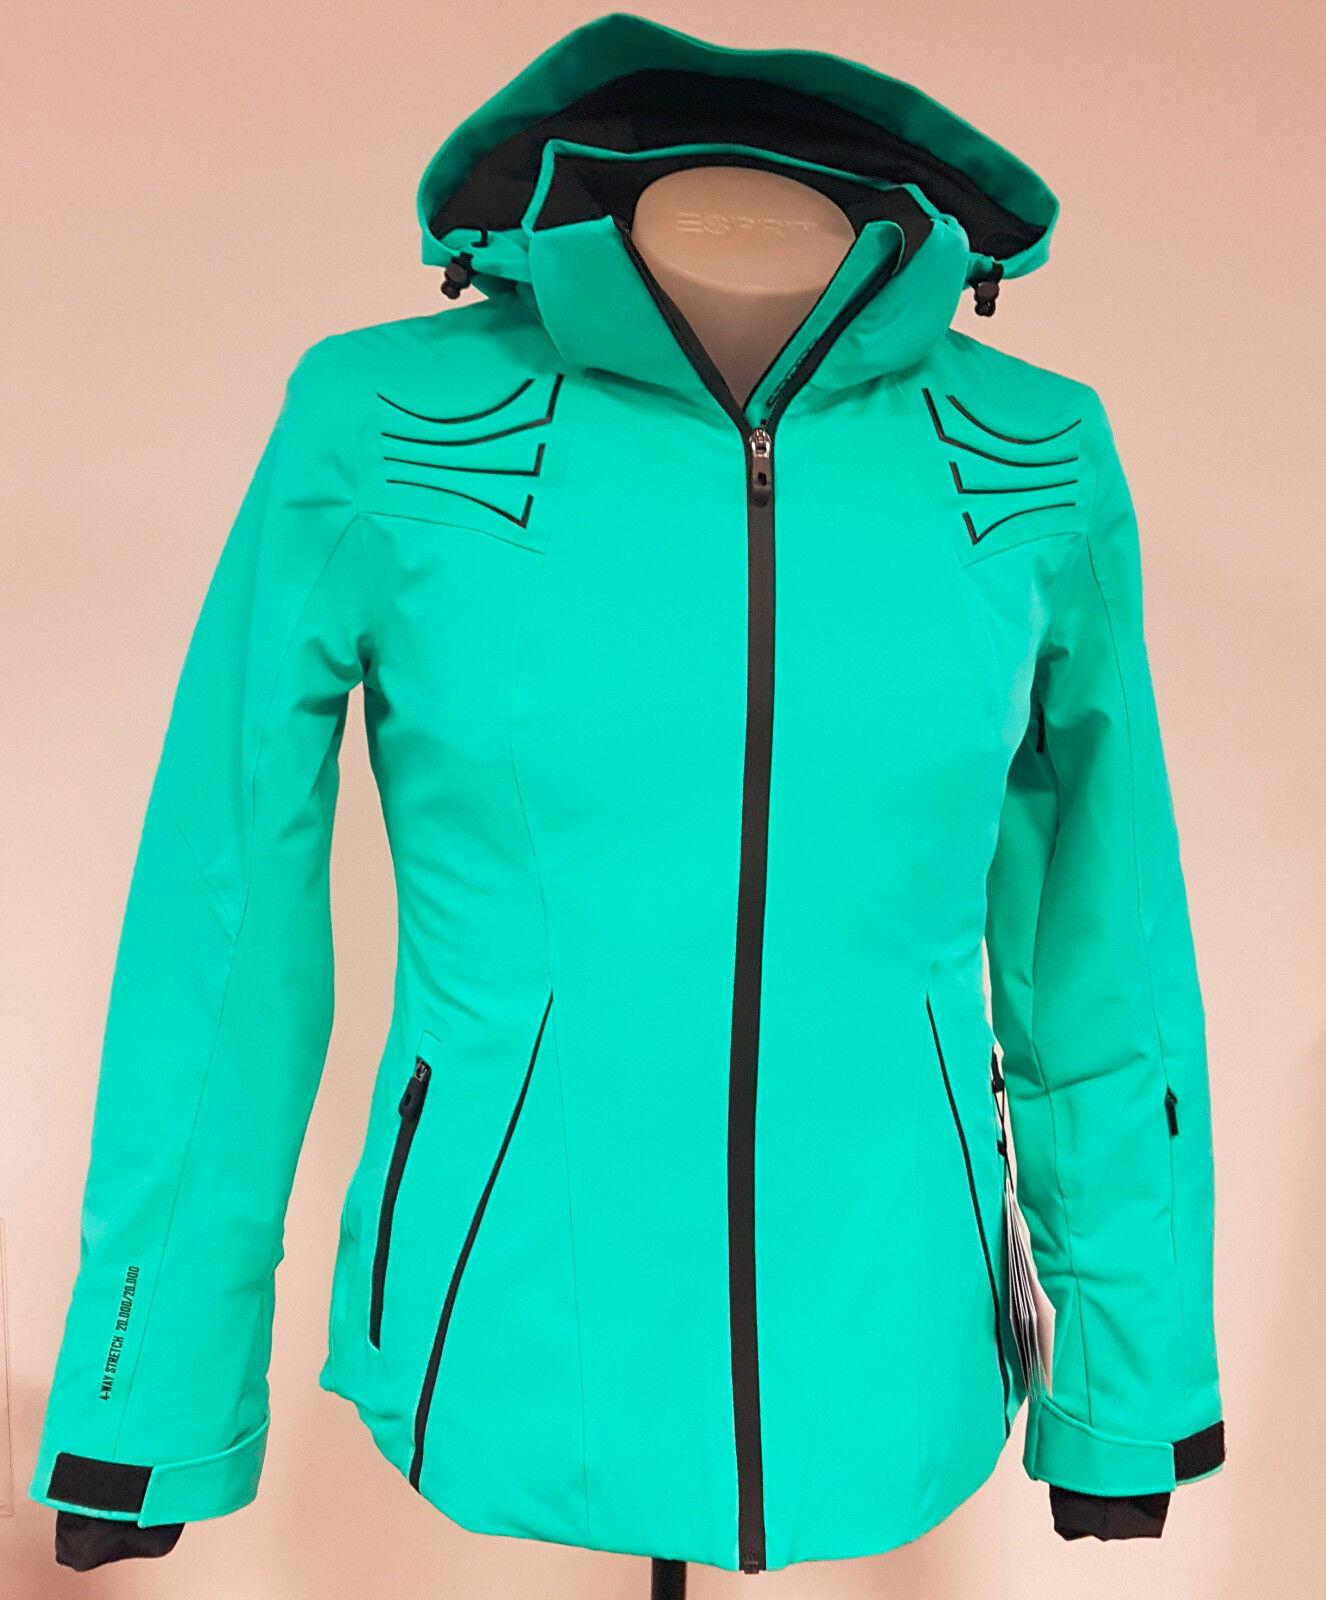 DIEL SPORT Skisport Winter Outdoor Damen Skijacke Madamen